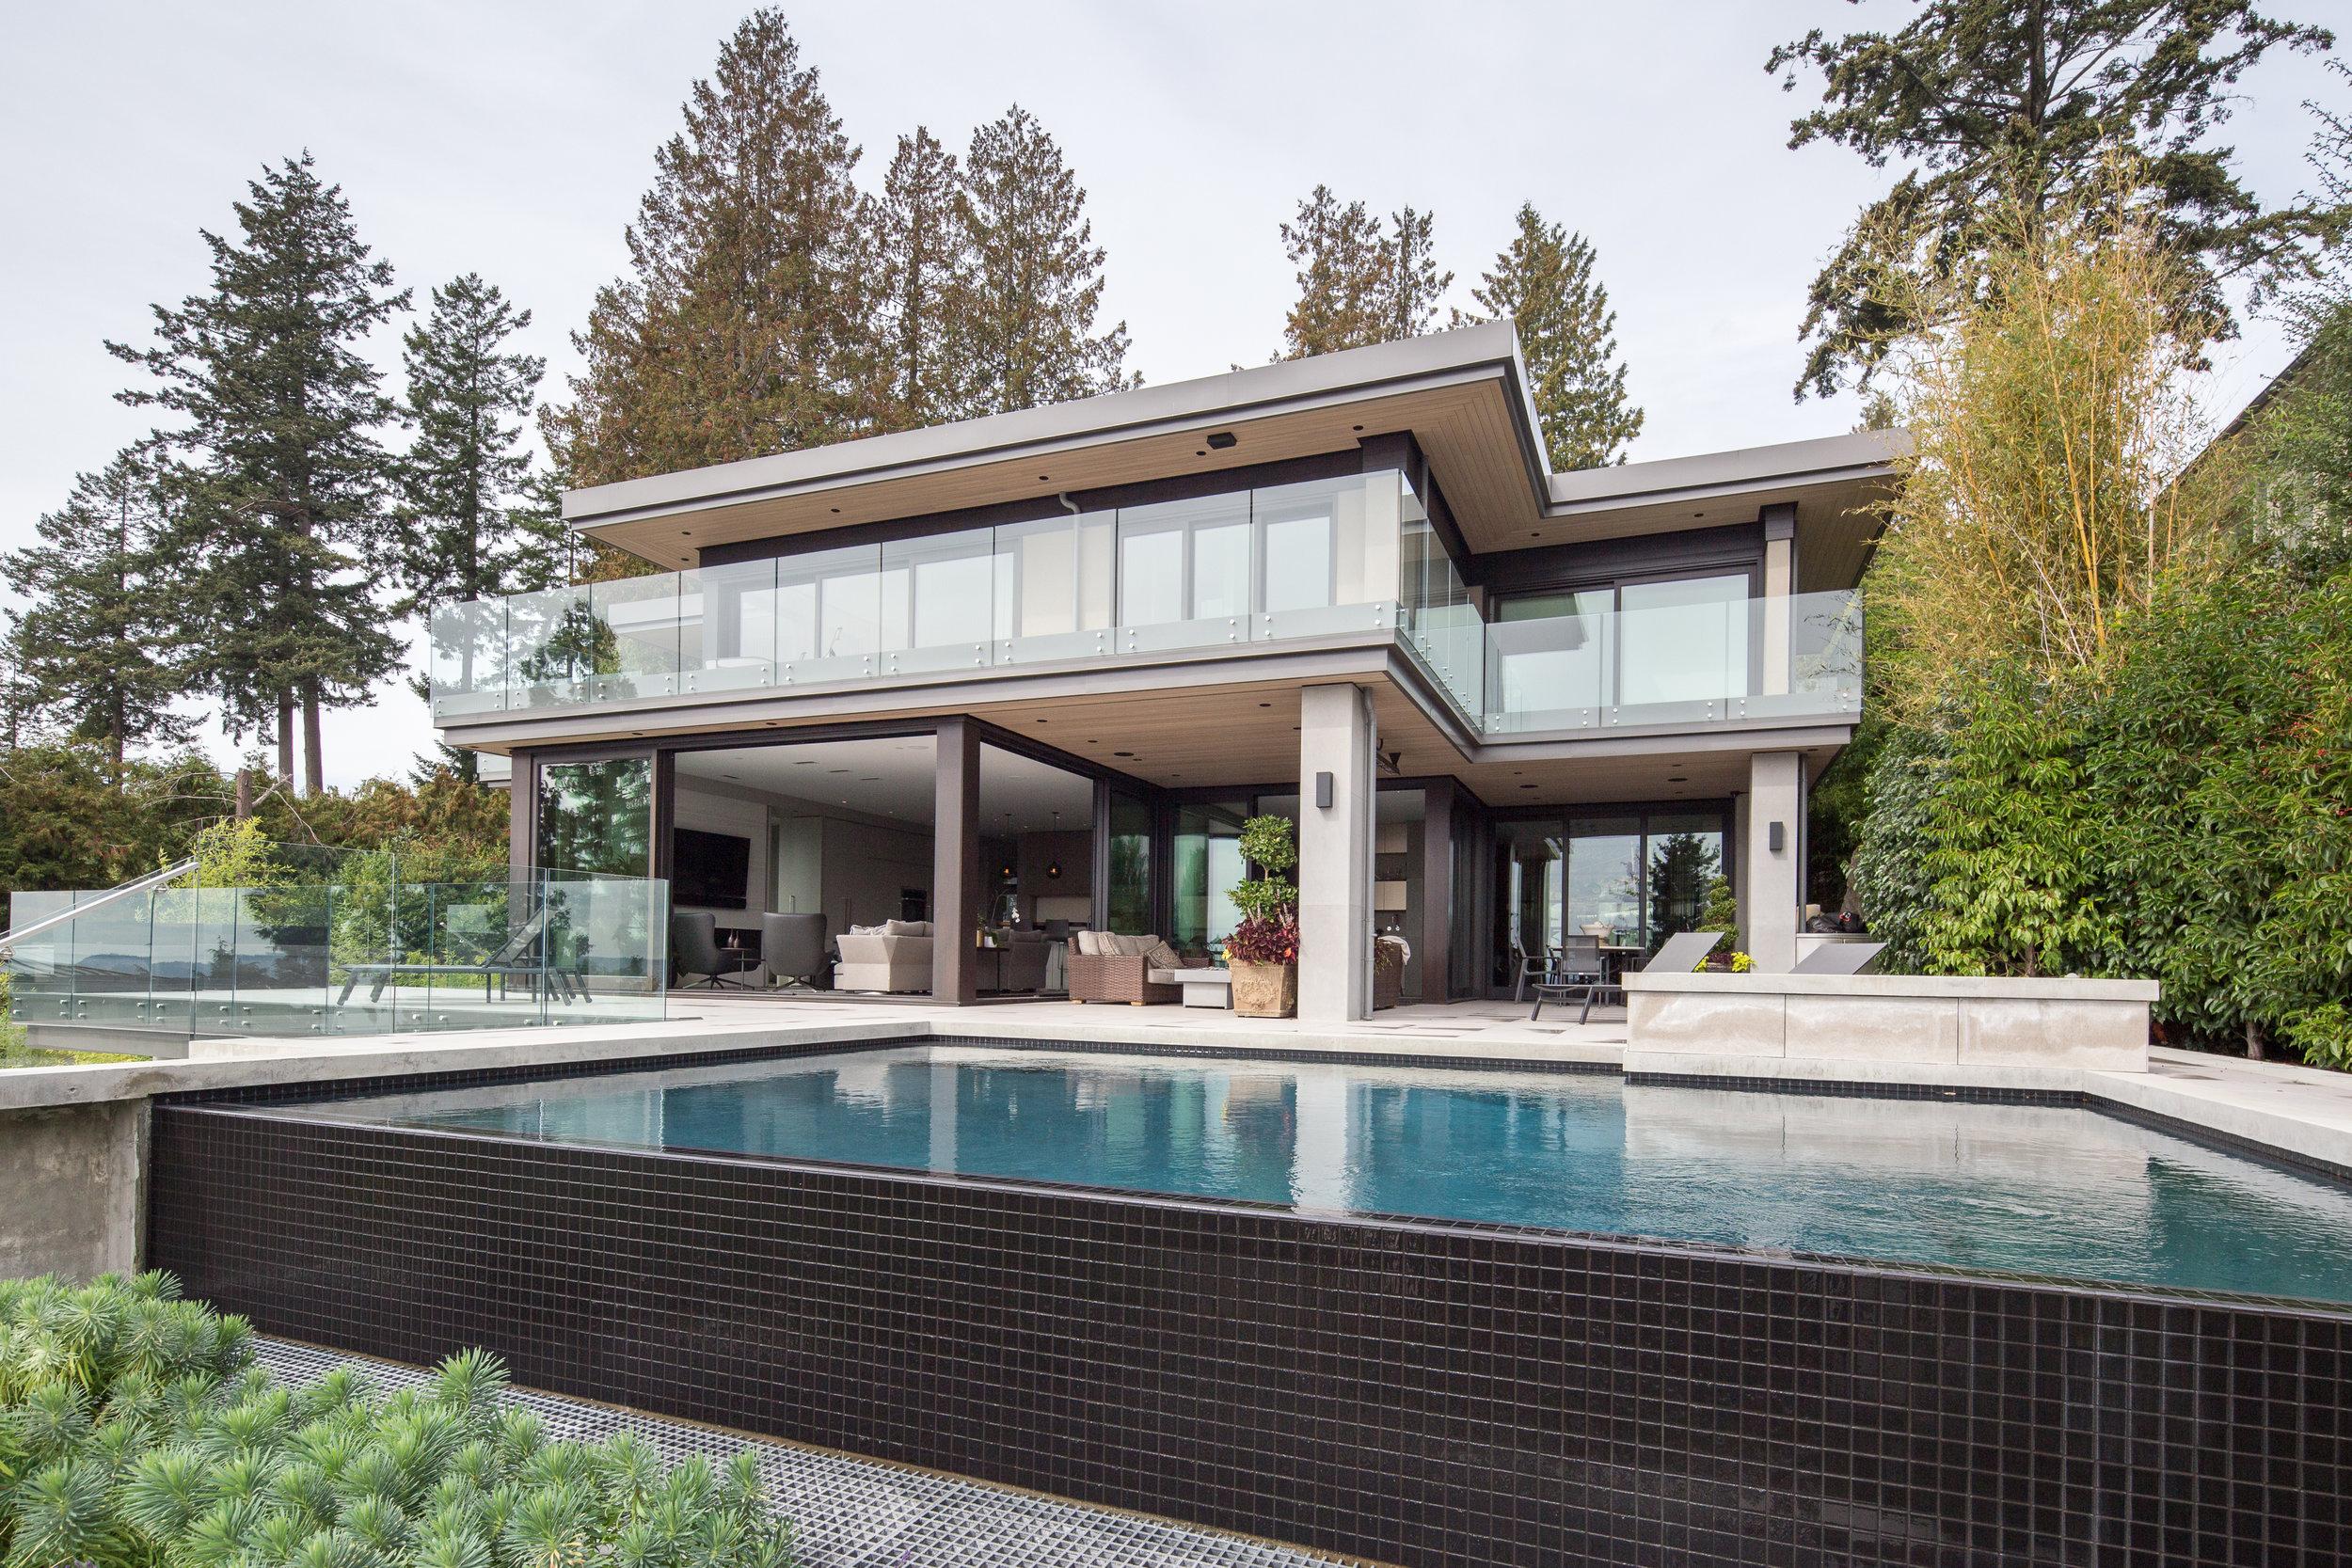 Client's Custom Built Home